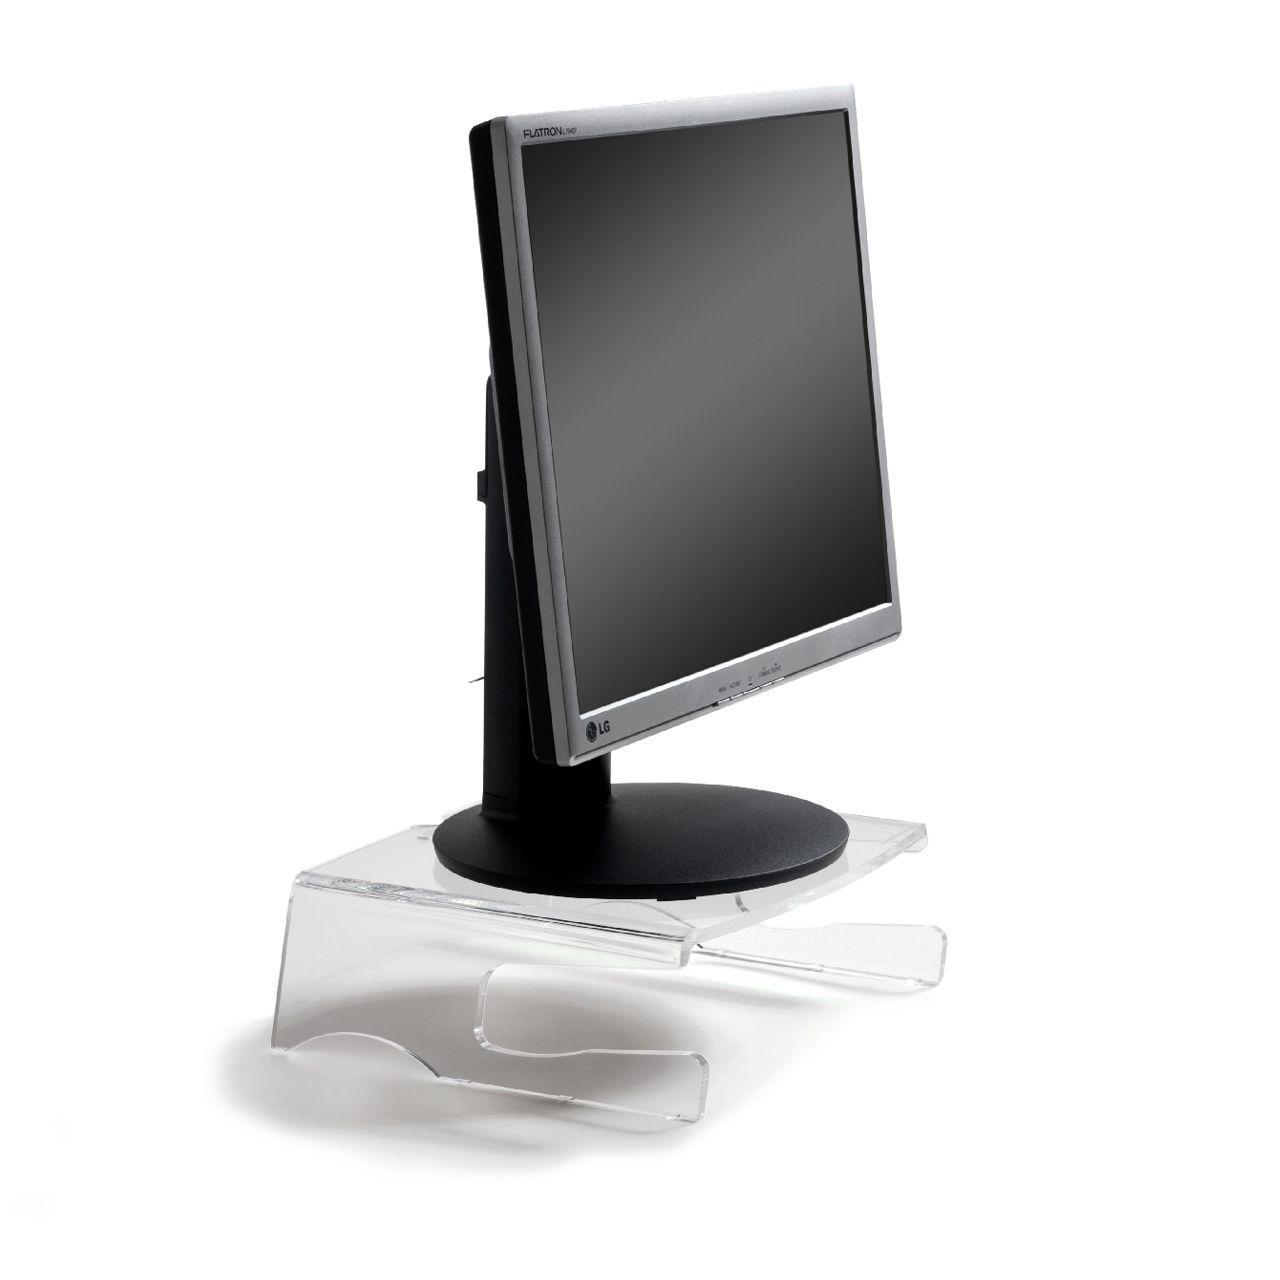 q riser 100 monitorsteun ERKAQ1058 Met Monitor